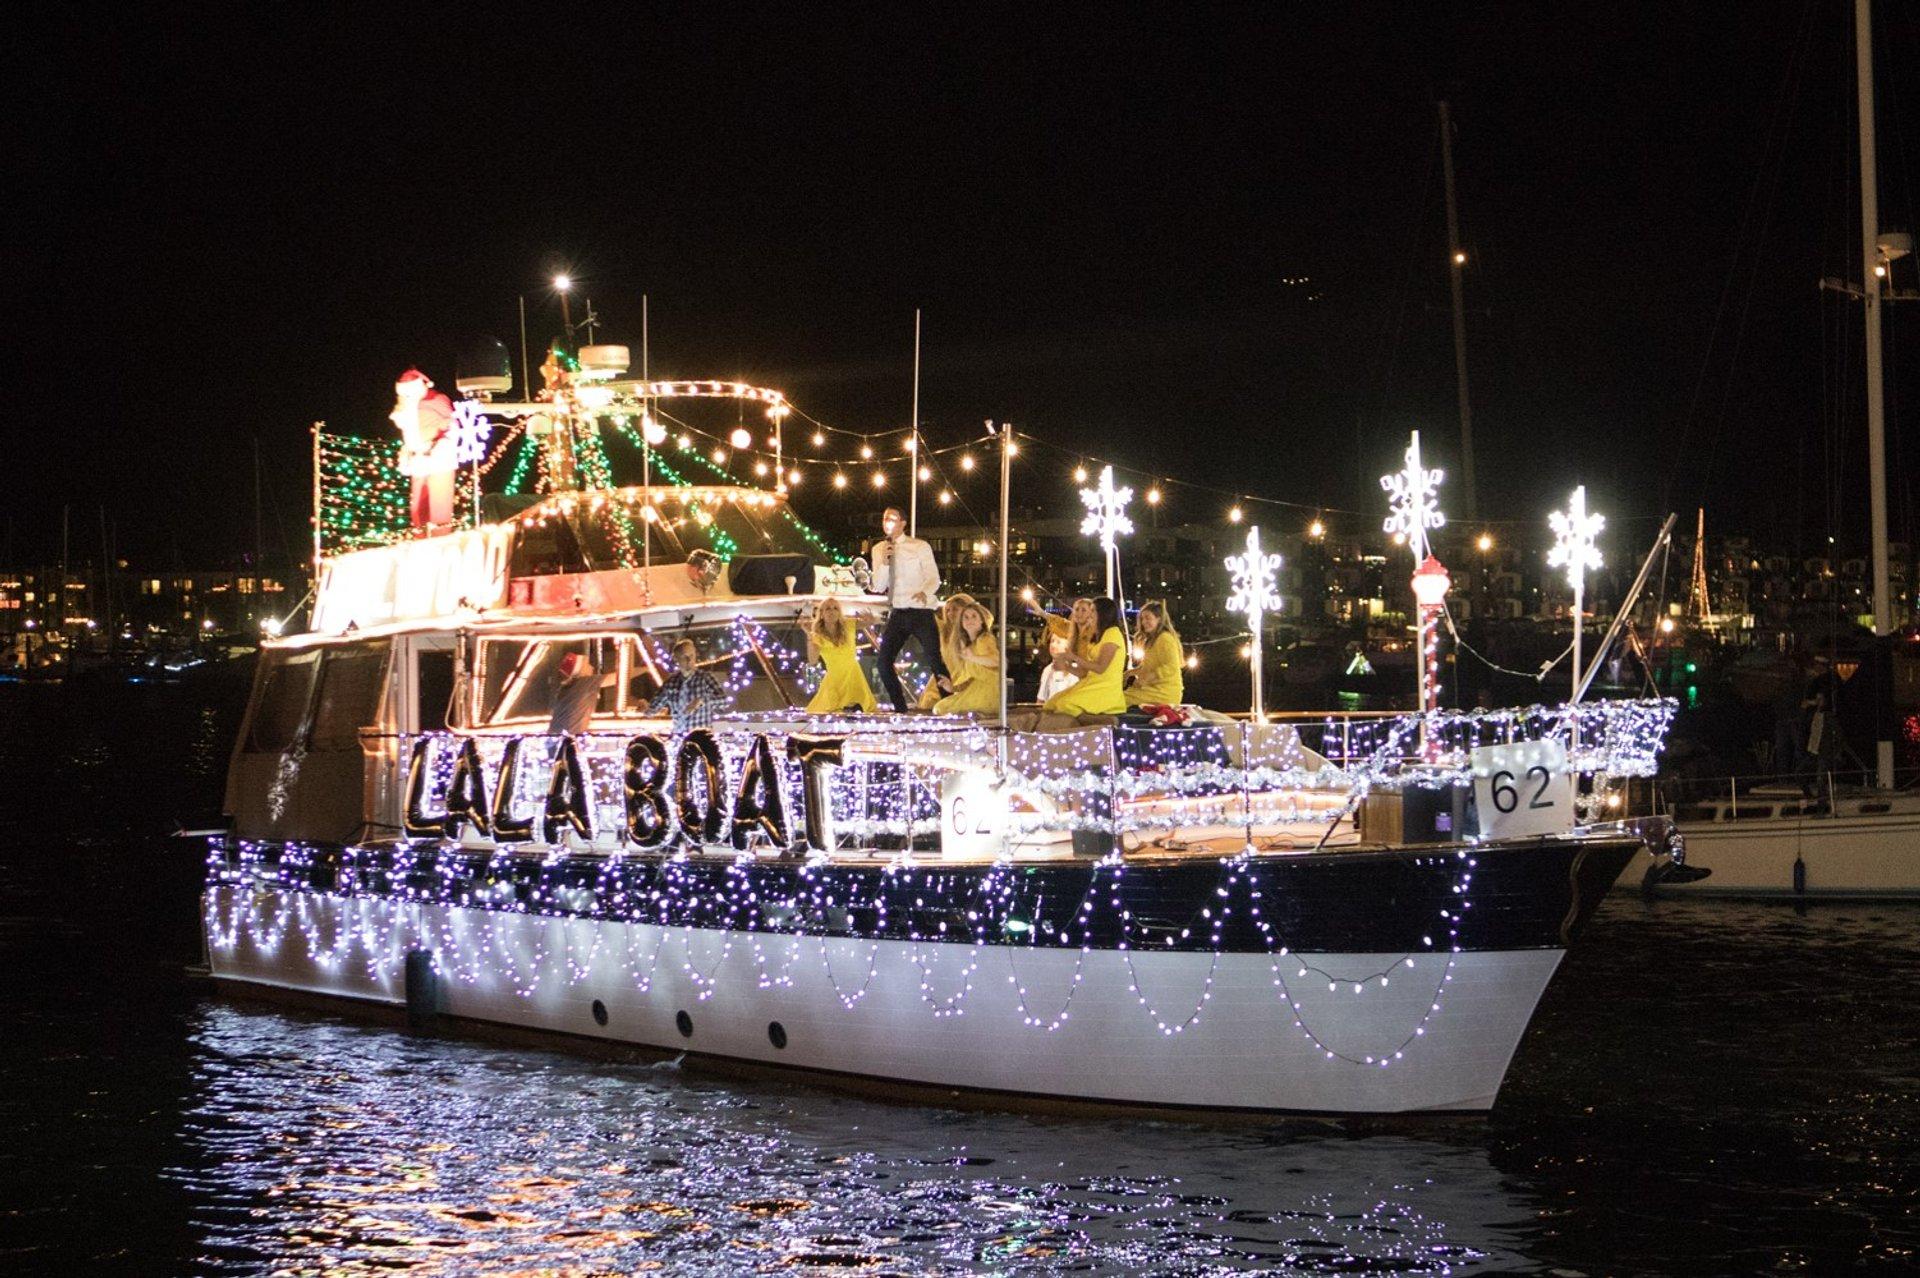 Marina del Rey Holiday Boat Parade in California - Best Season 2020